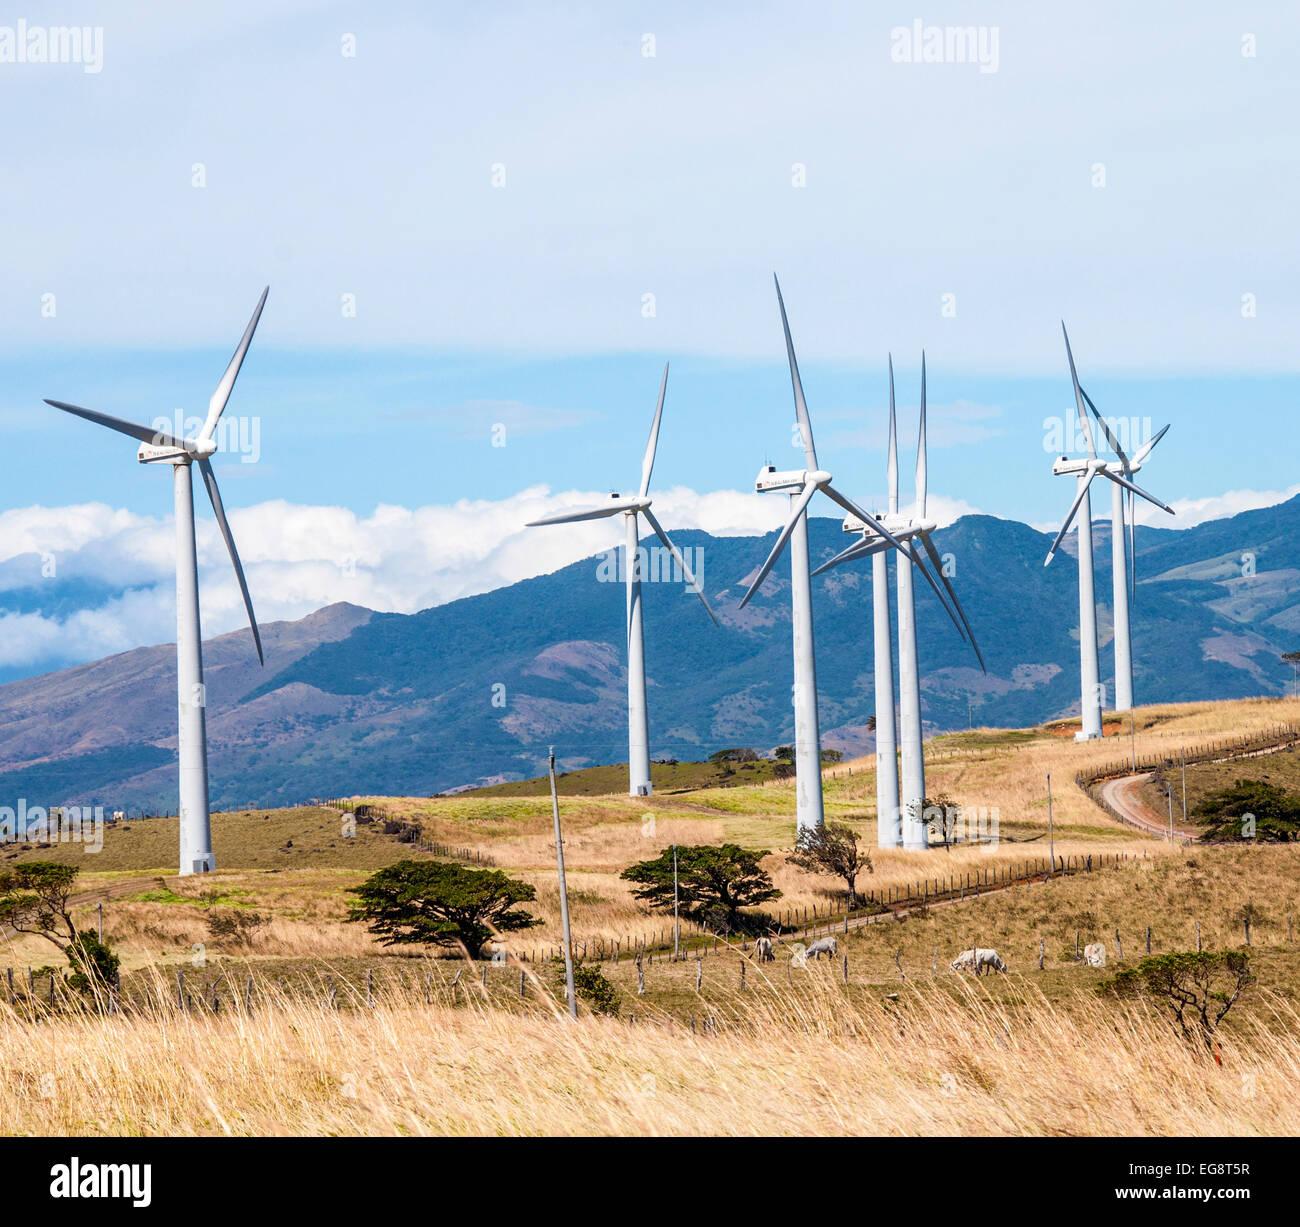 Wind generators in Costa Rica. - Stock Image